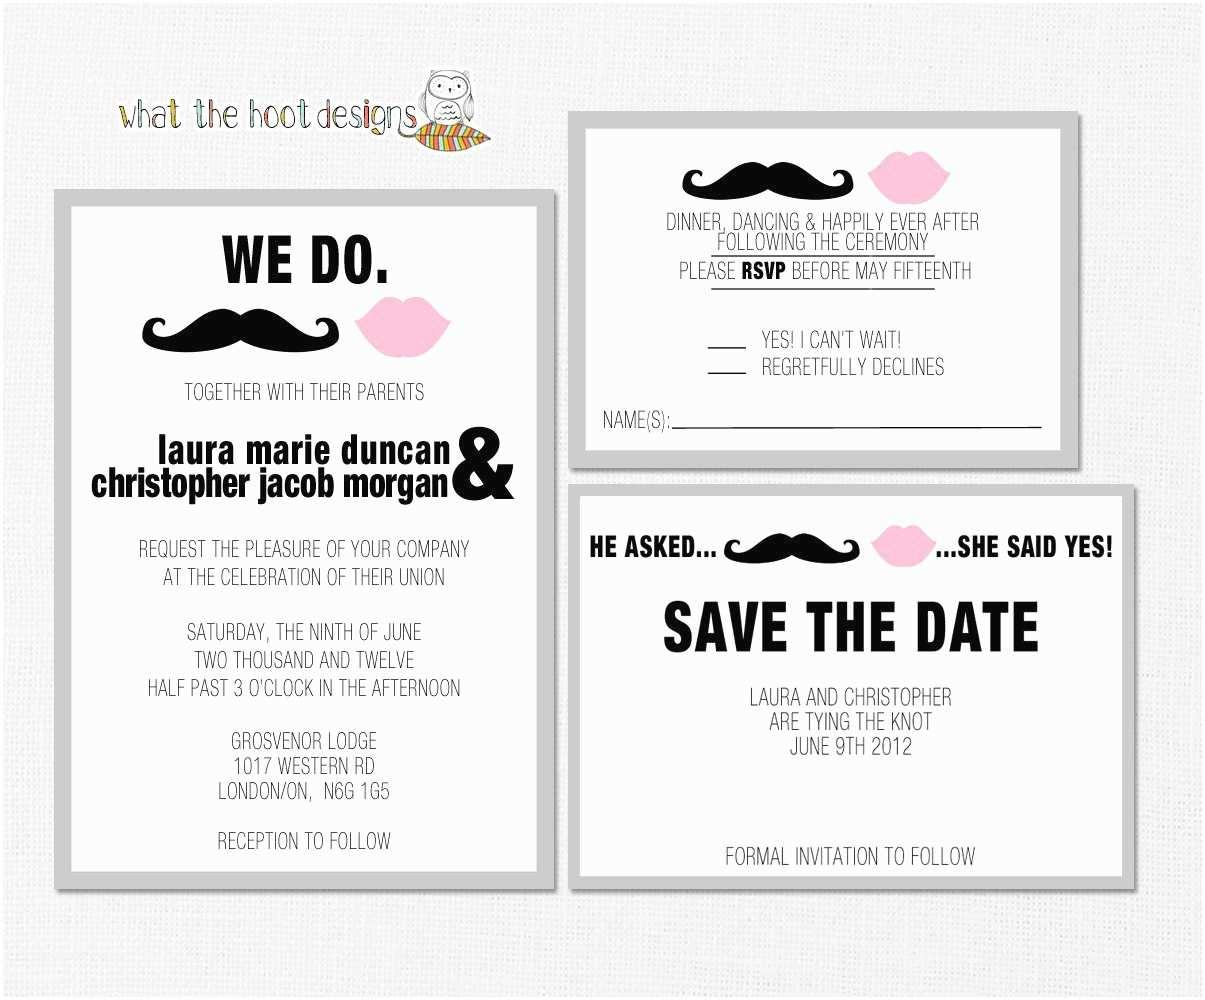 Wedding Invitations with Rsvp Wedding Invitation Wedding Invitations Response Cards